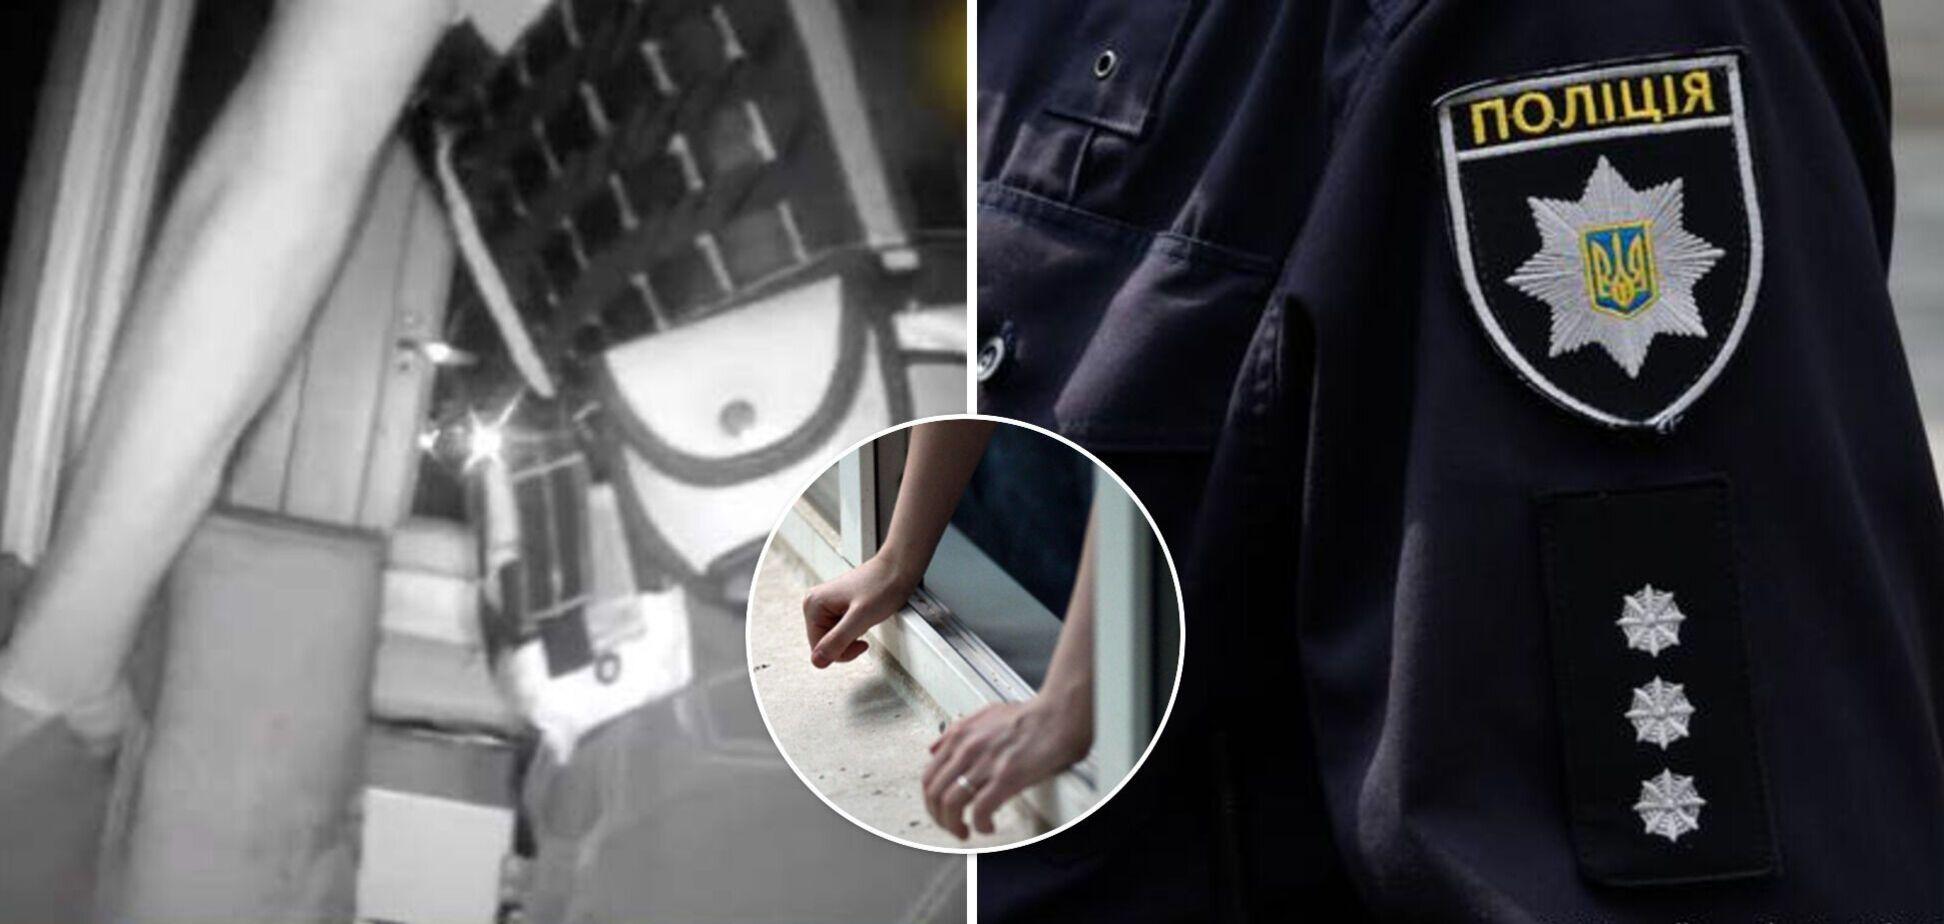 В Черновцах мужчина выпал с 8-го этажа: от смерти спасла антенна соседки. Видео